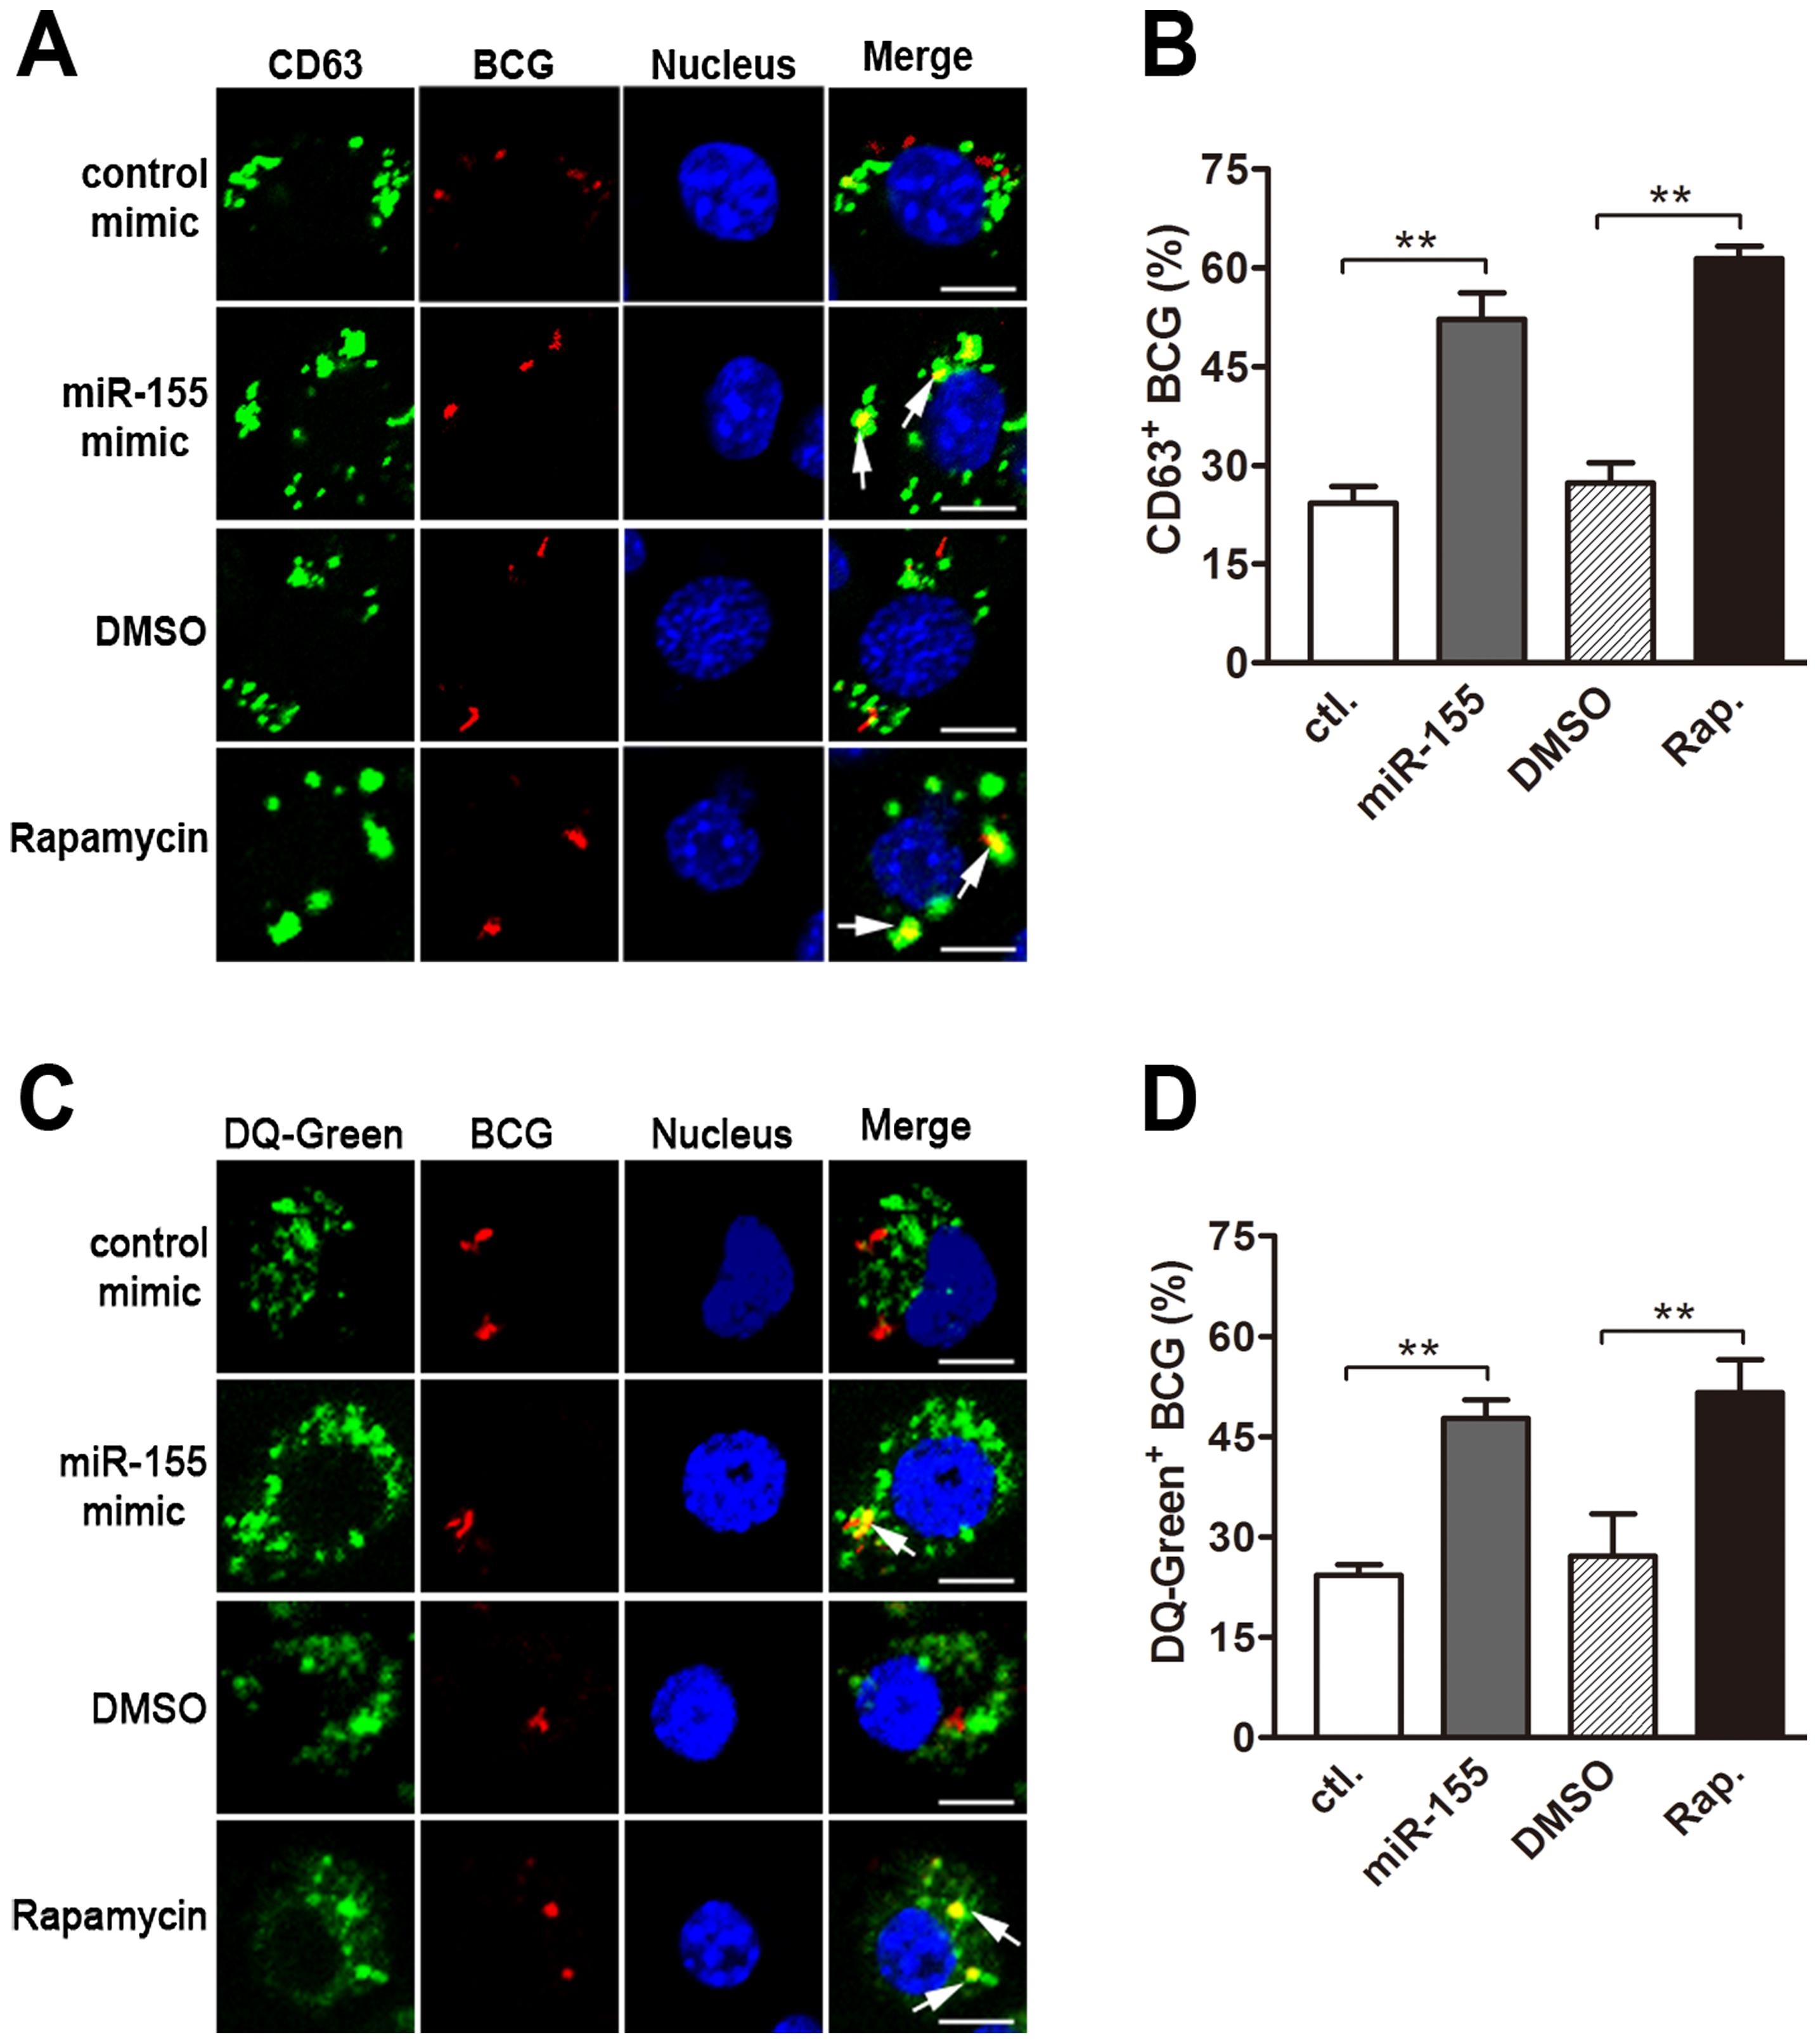 miR-155 promotes mycobacterial phagosome maturation.